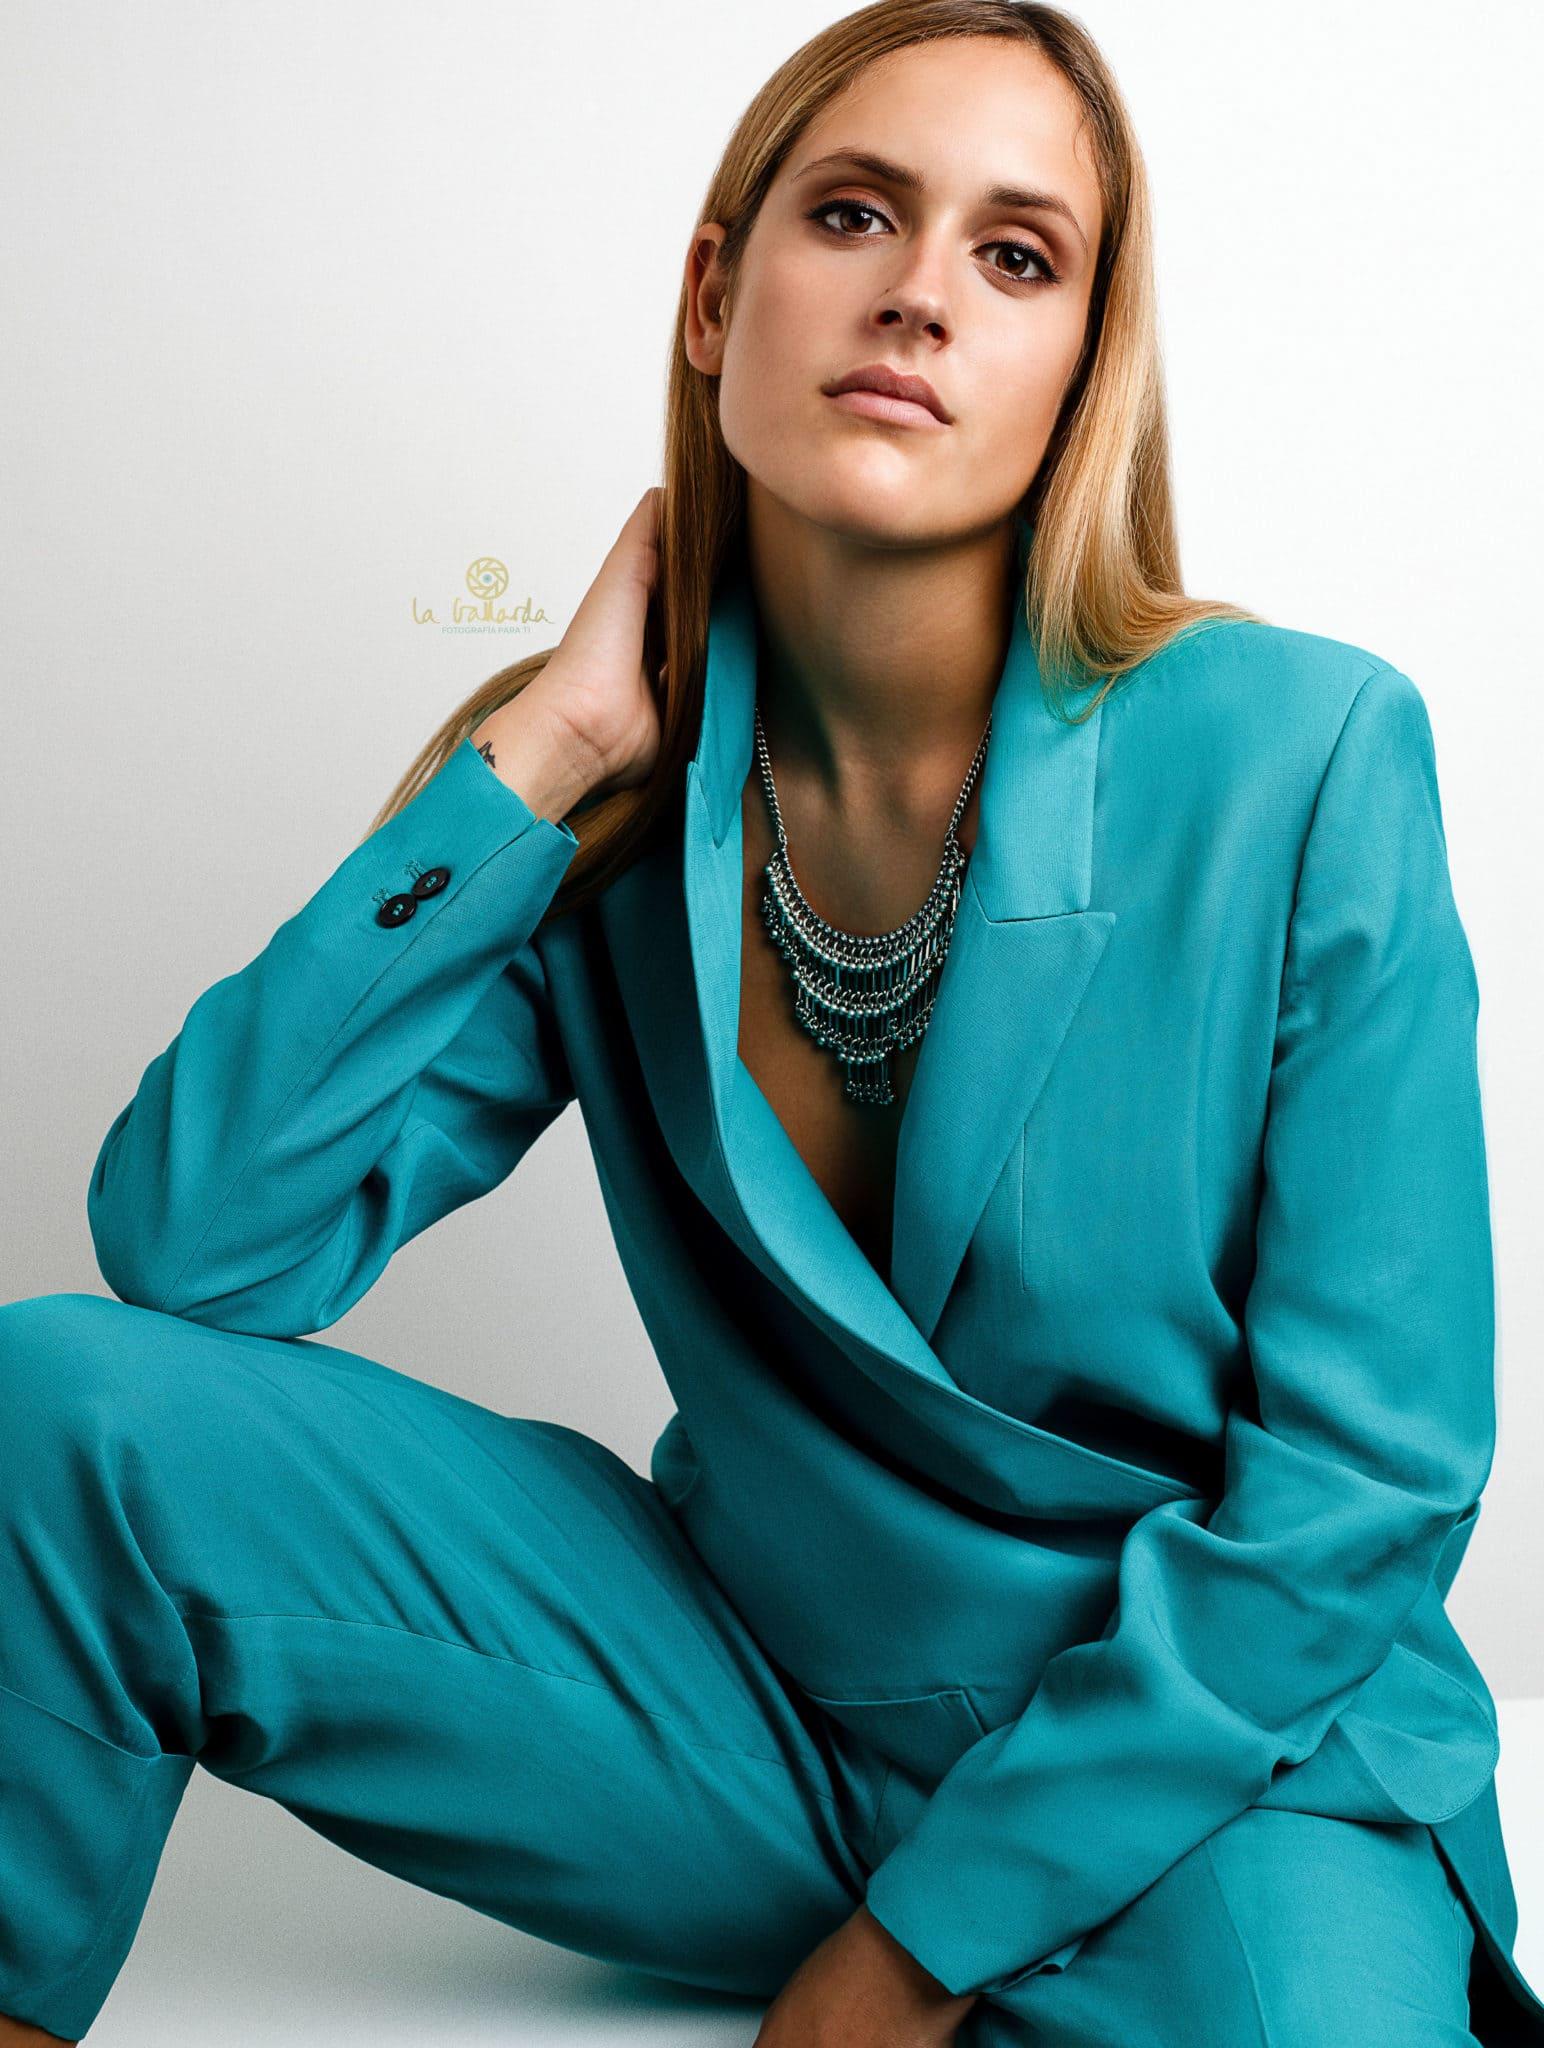 Lucía Arias modelo Next Iconic Silver Francina Models Modelos La Gallarda Fotografia Profesional estudio fotografico Malaga Alhaurin photographer fotografo retrato boudoir moda familia espacios